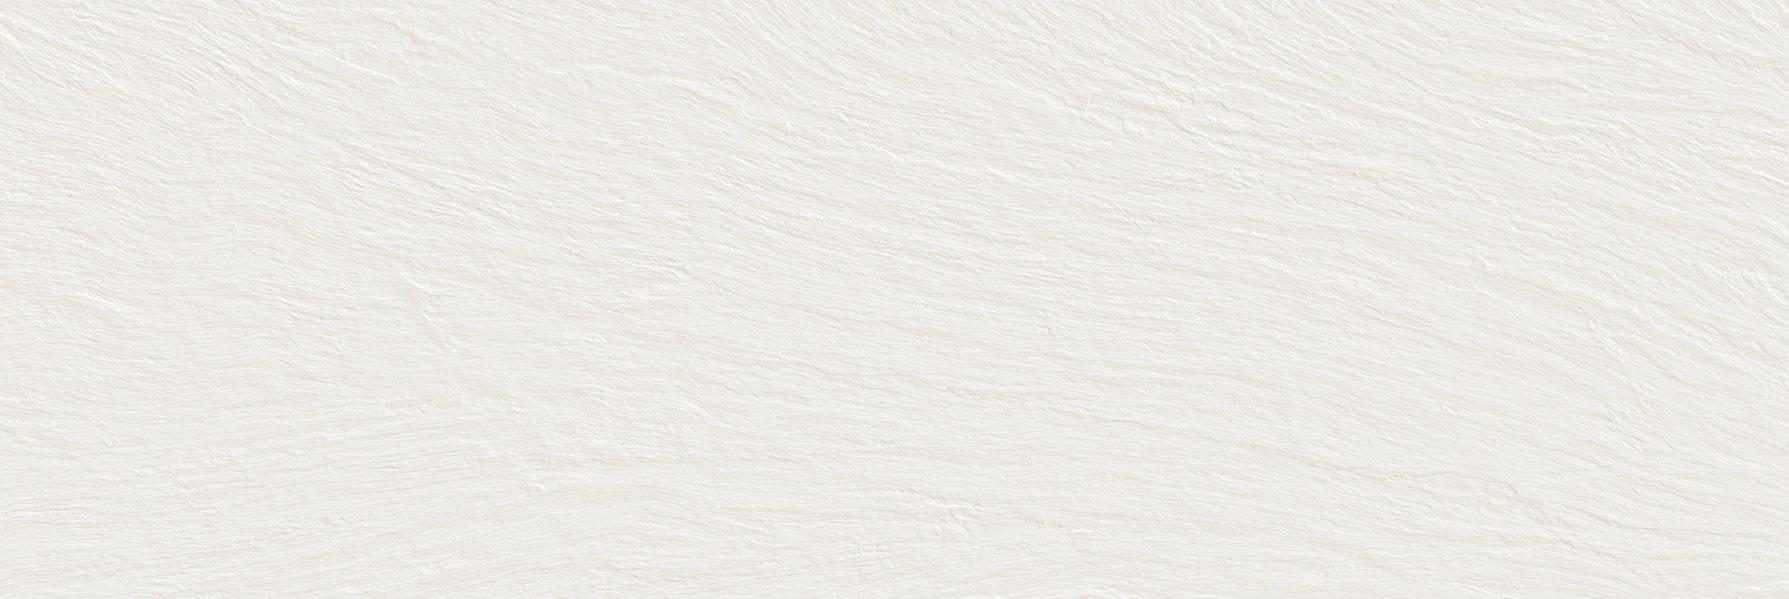 Laminam Ardesia Bianco a Spacco